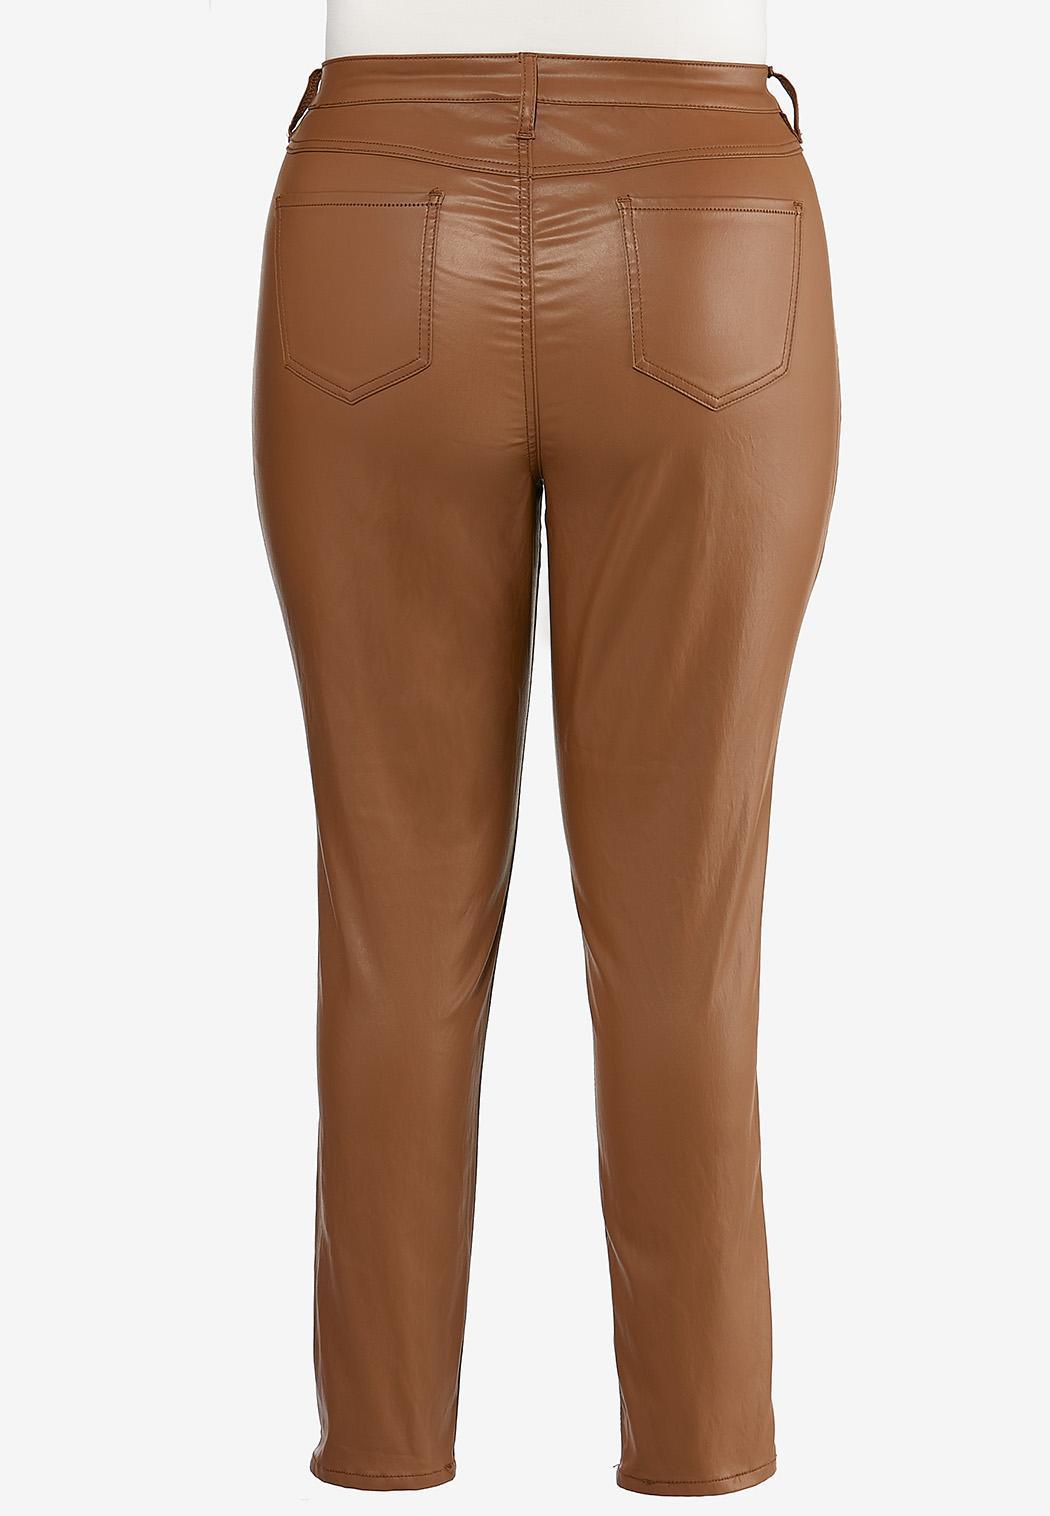 Plus Size Caramel Coated Jeans (Item #44401724)